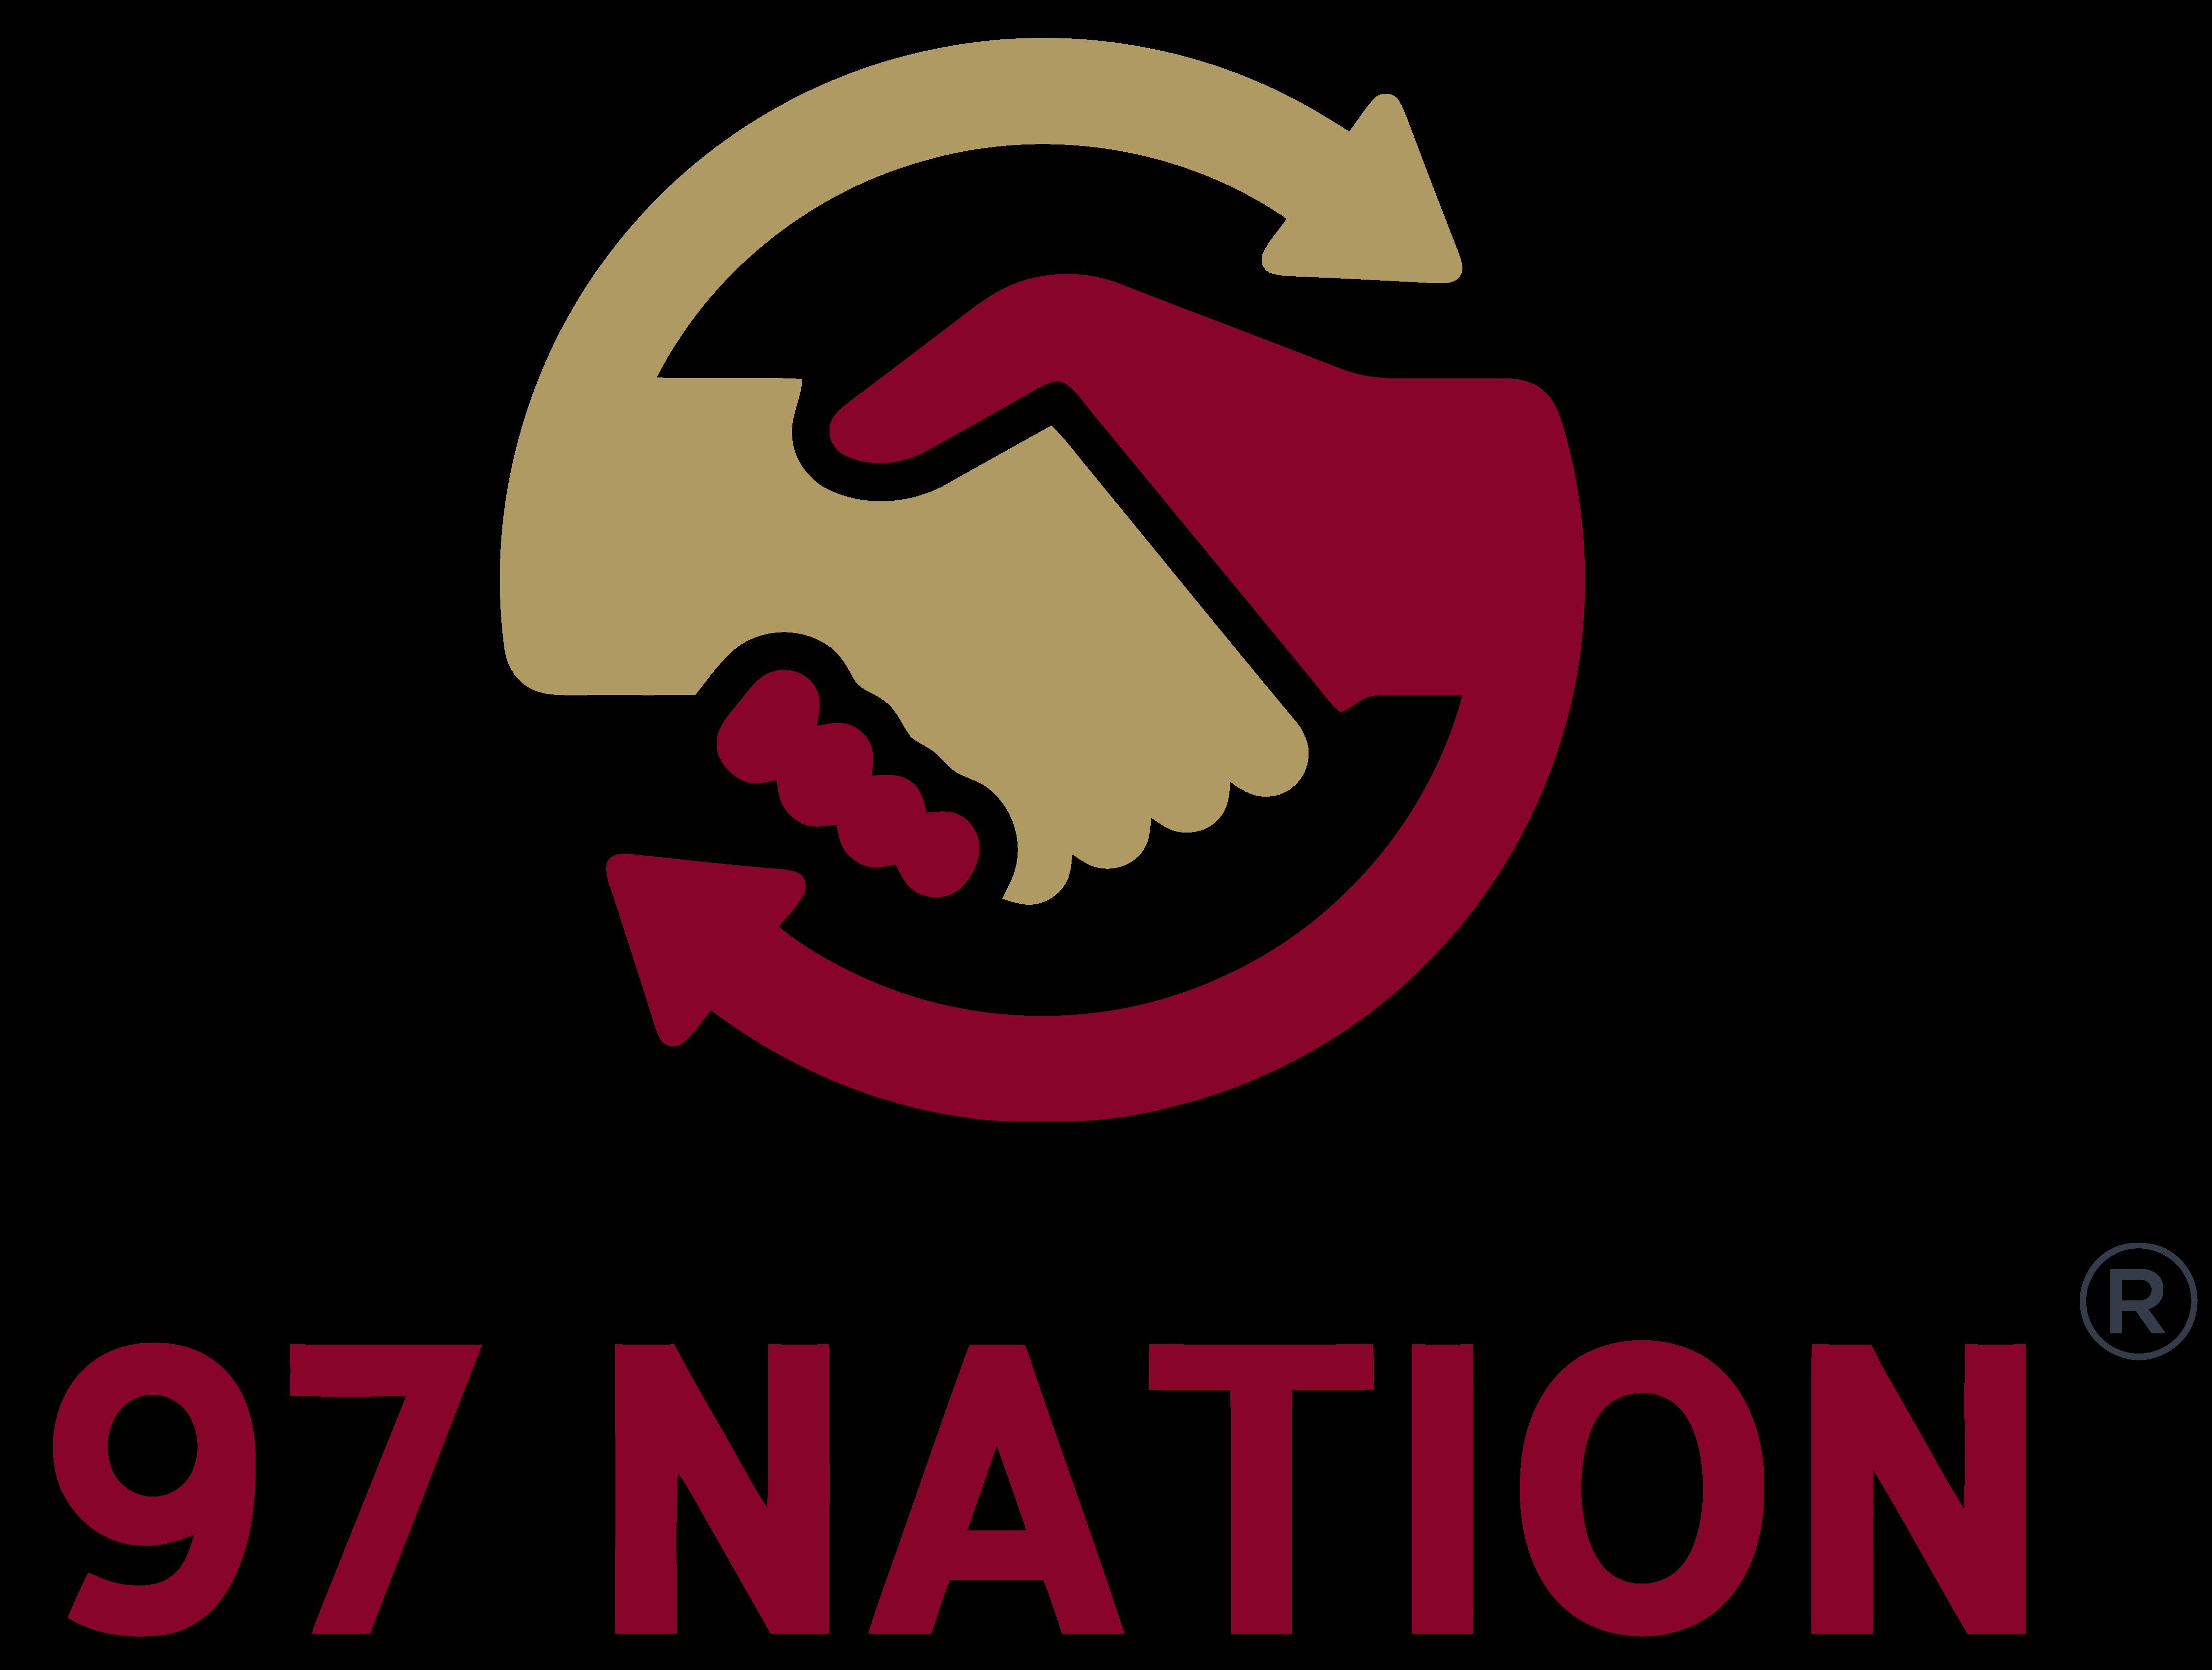 97Nation